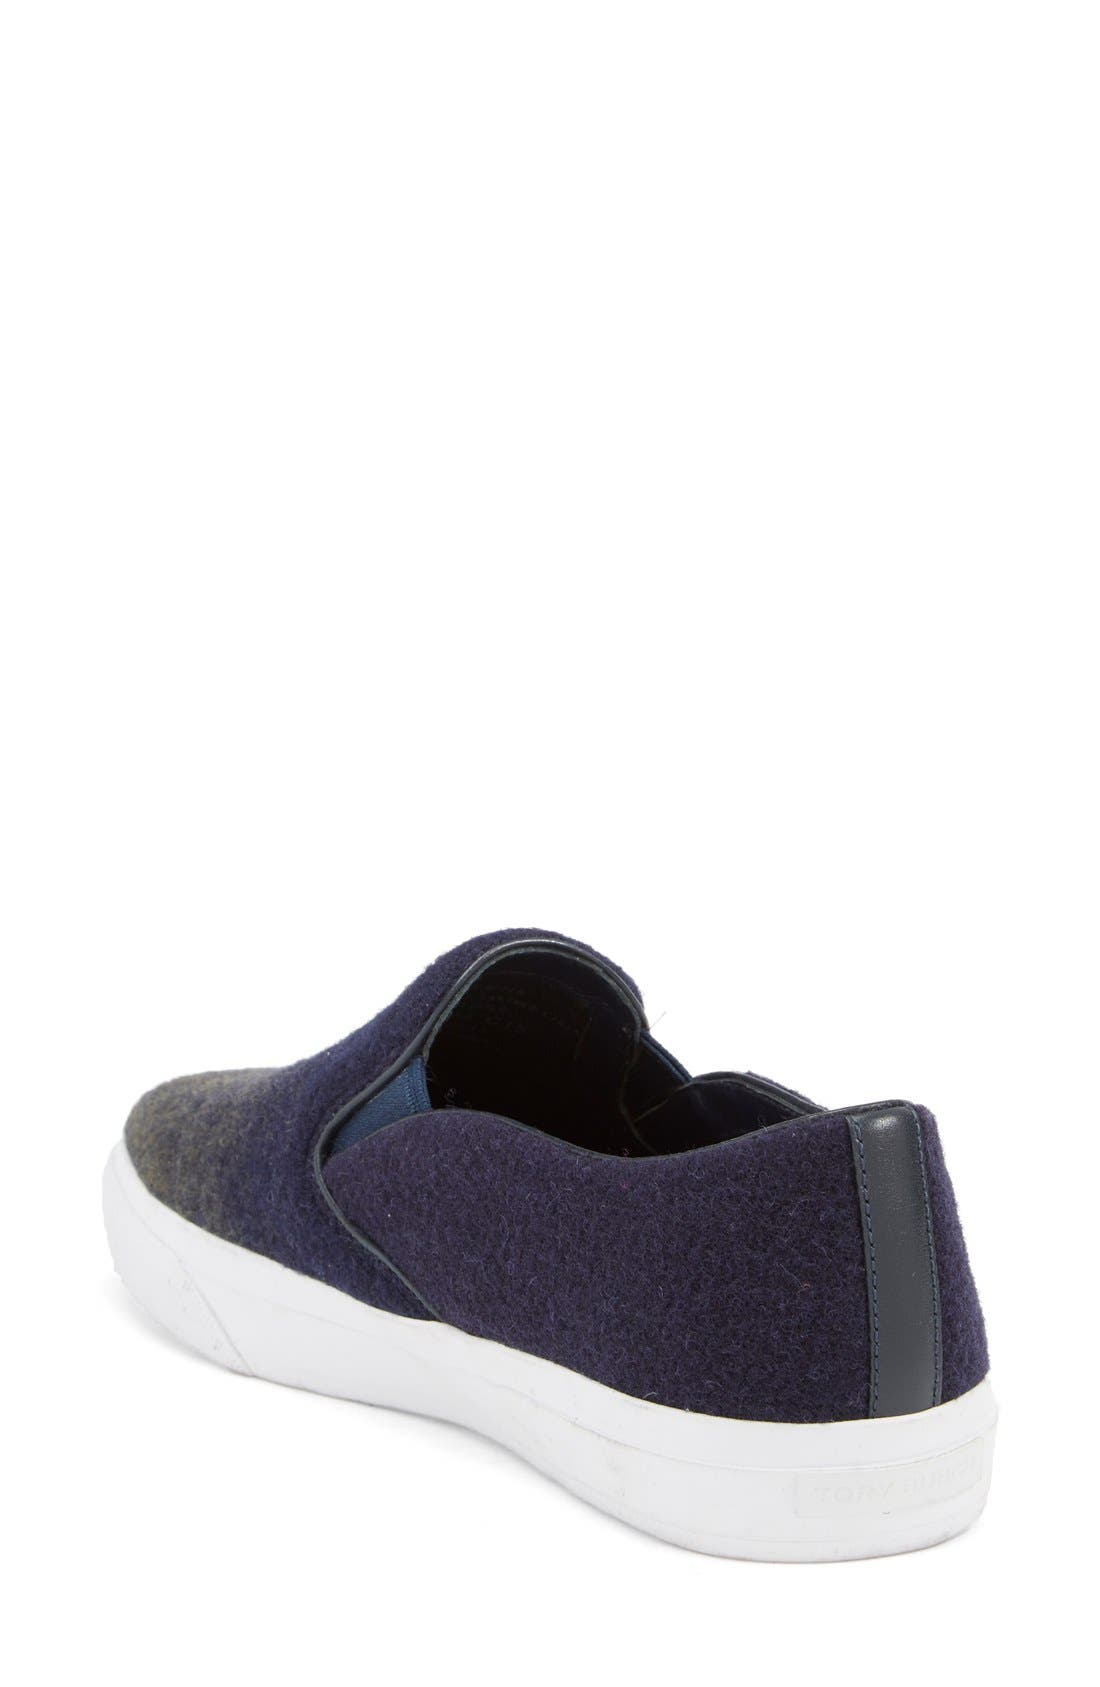 Alternate Image 2  - Tory Burch 'Stardust' Slip-On Sneaker (Women)